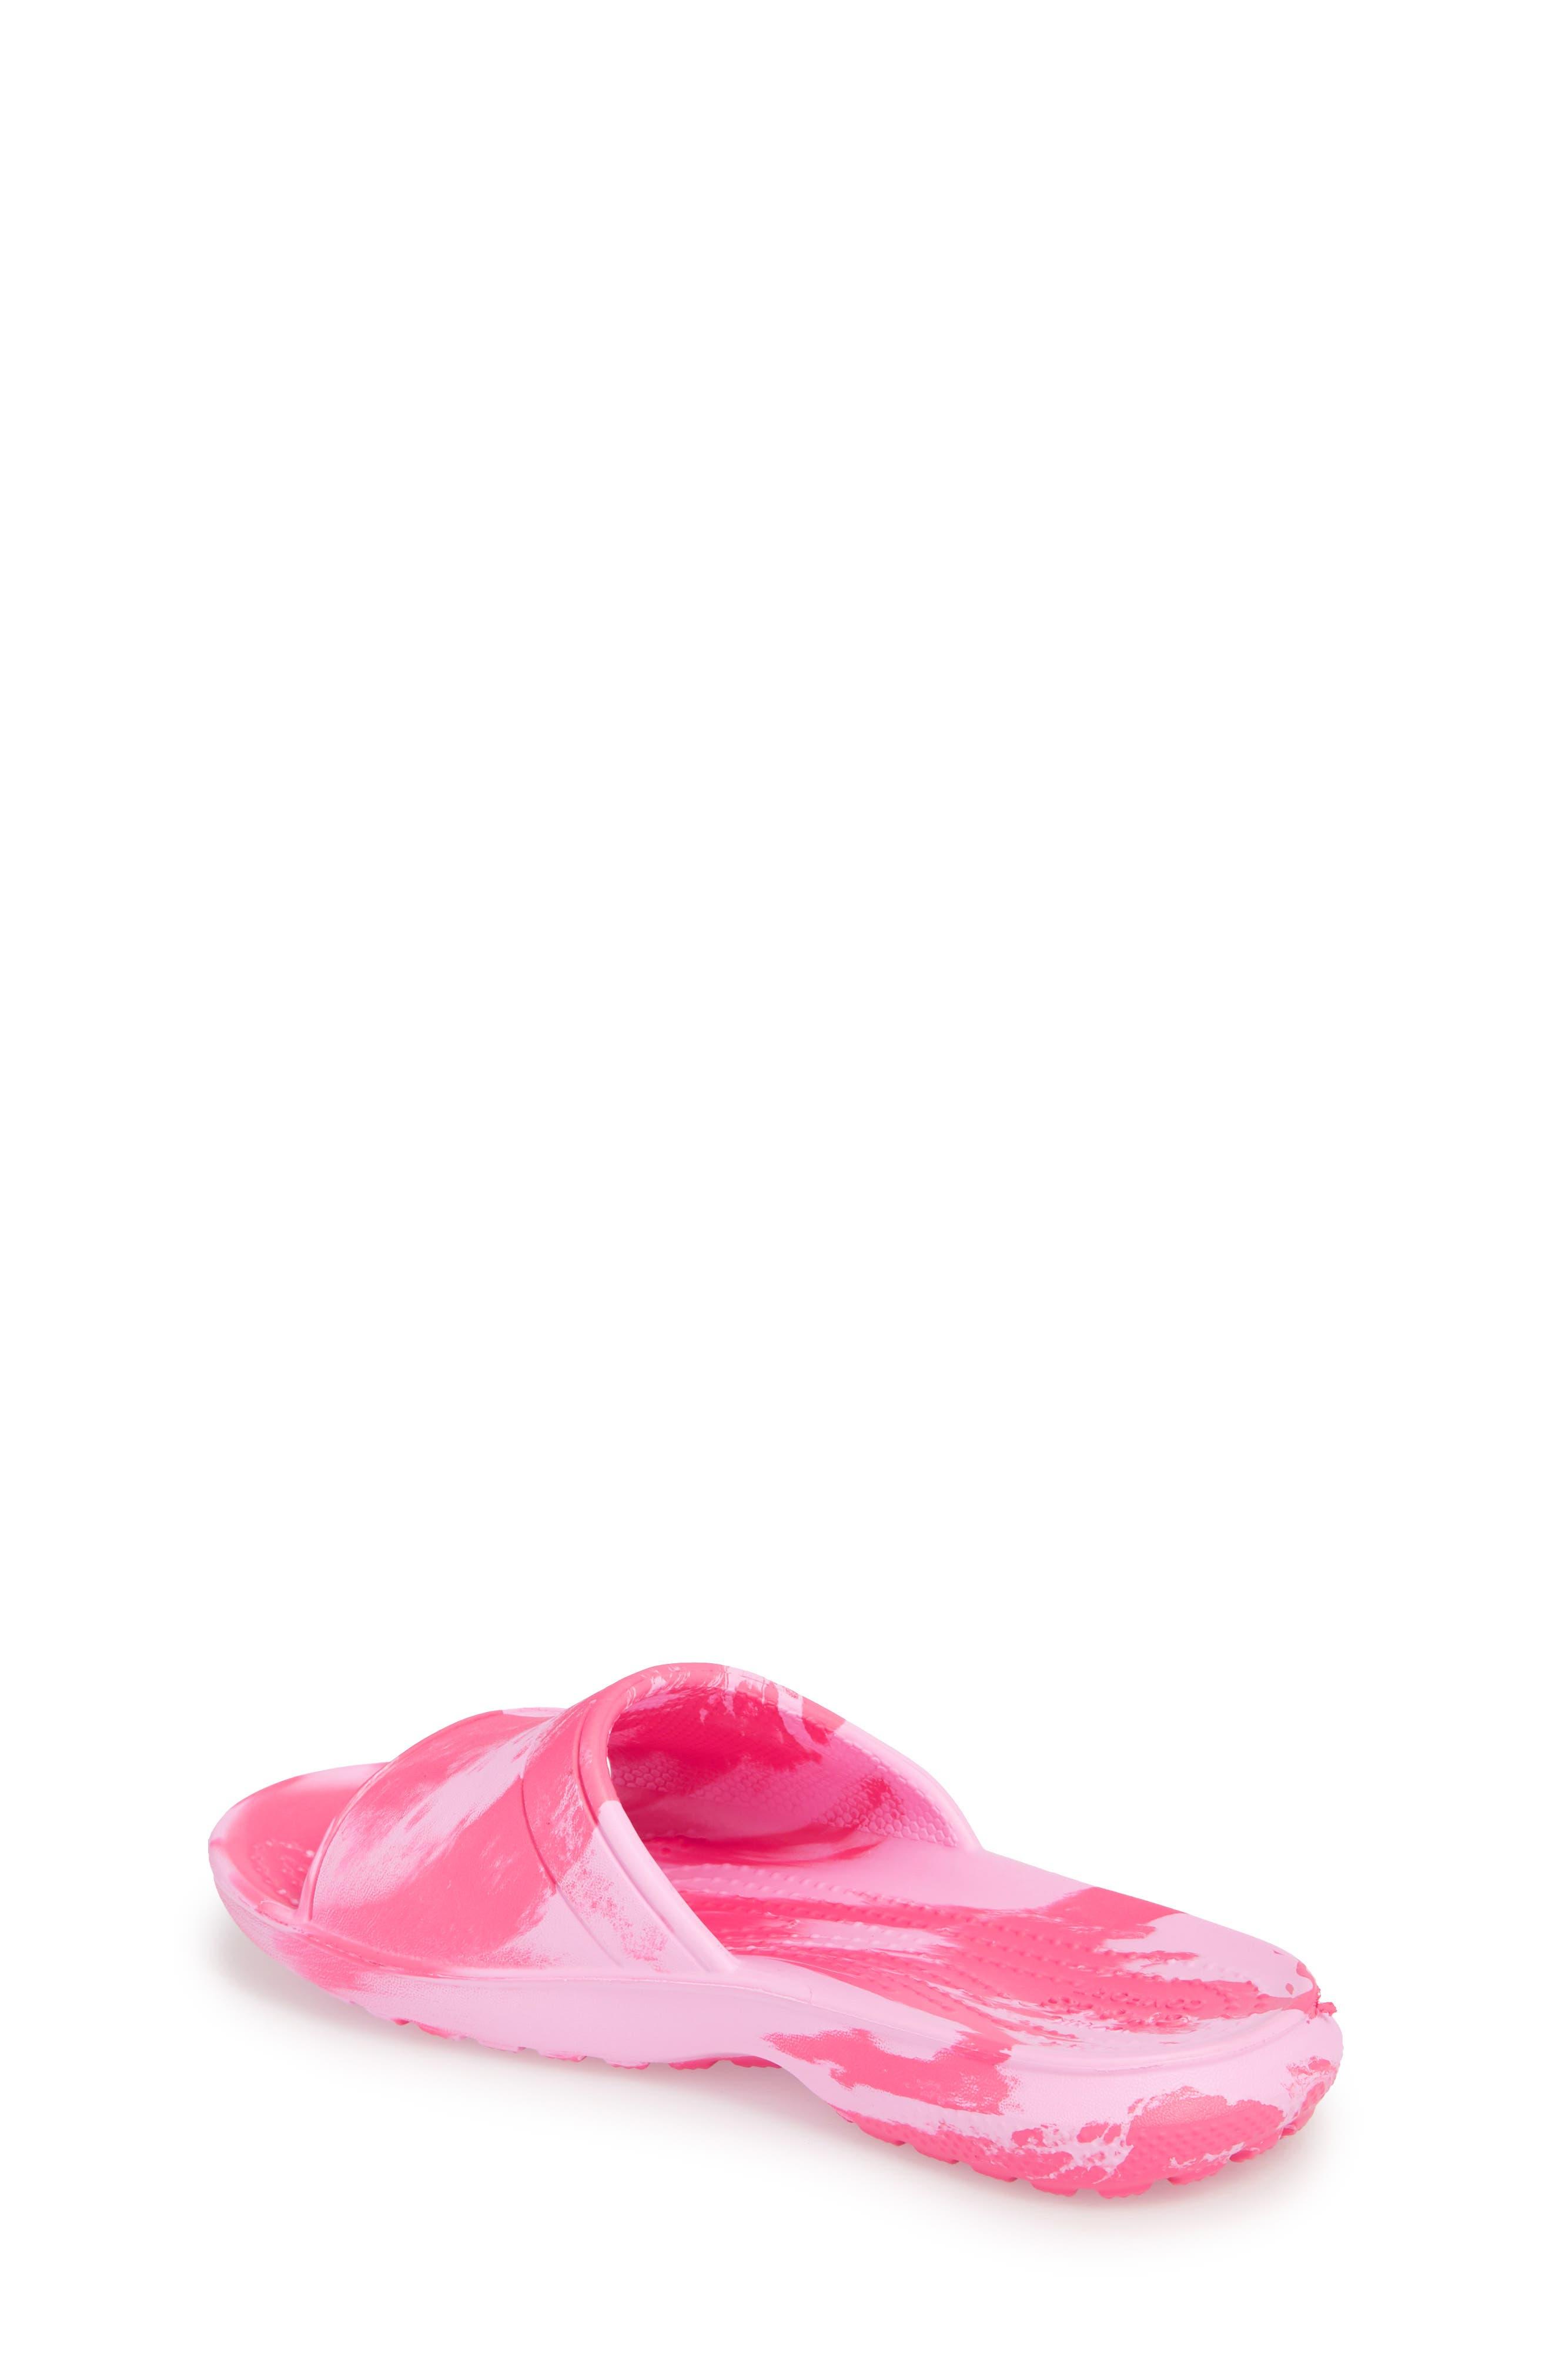 Classic Swirl Slide,                             Alternate thumbnail 2, color,                             Paradise Pink